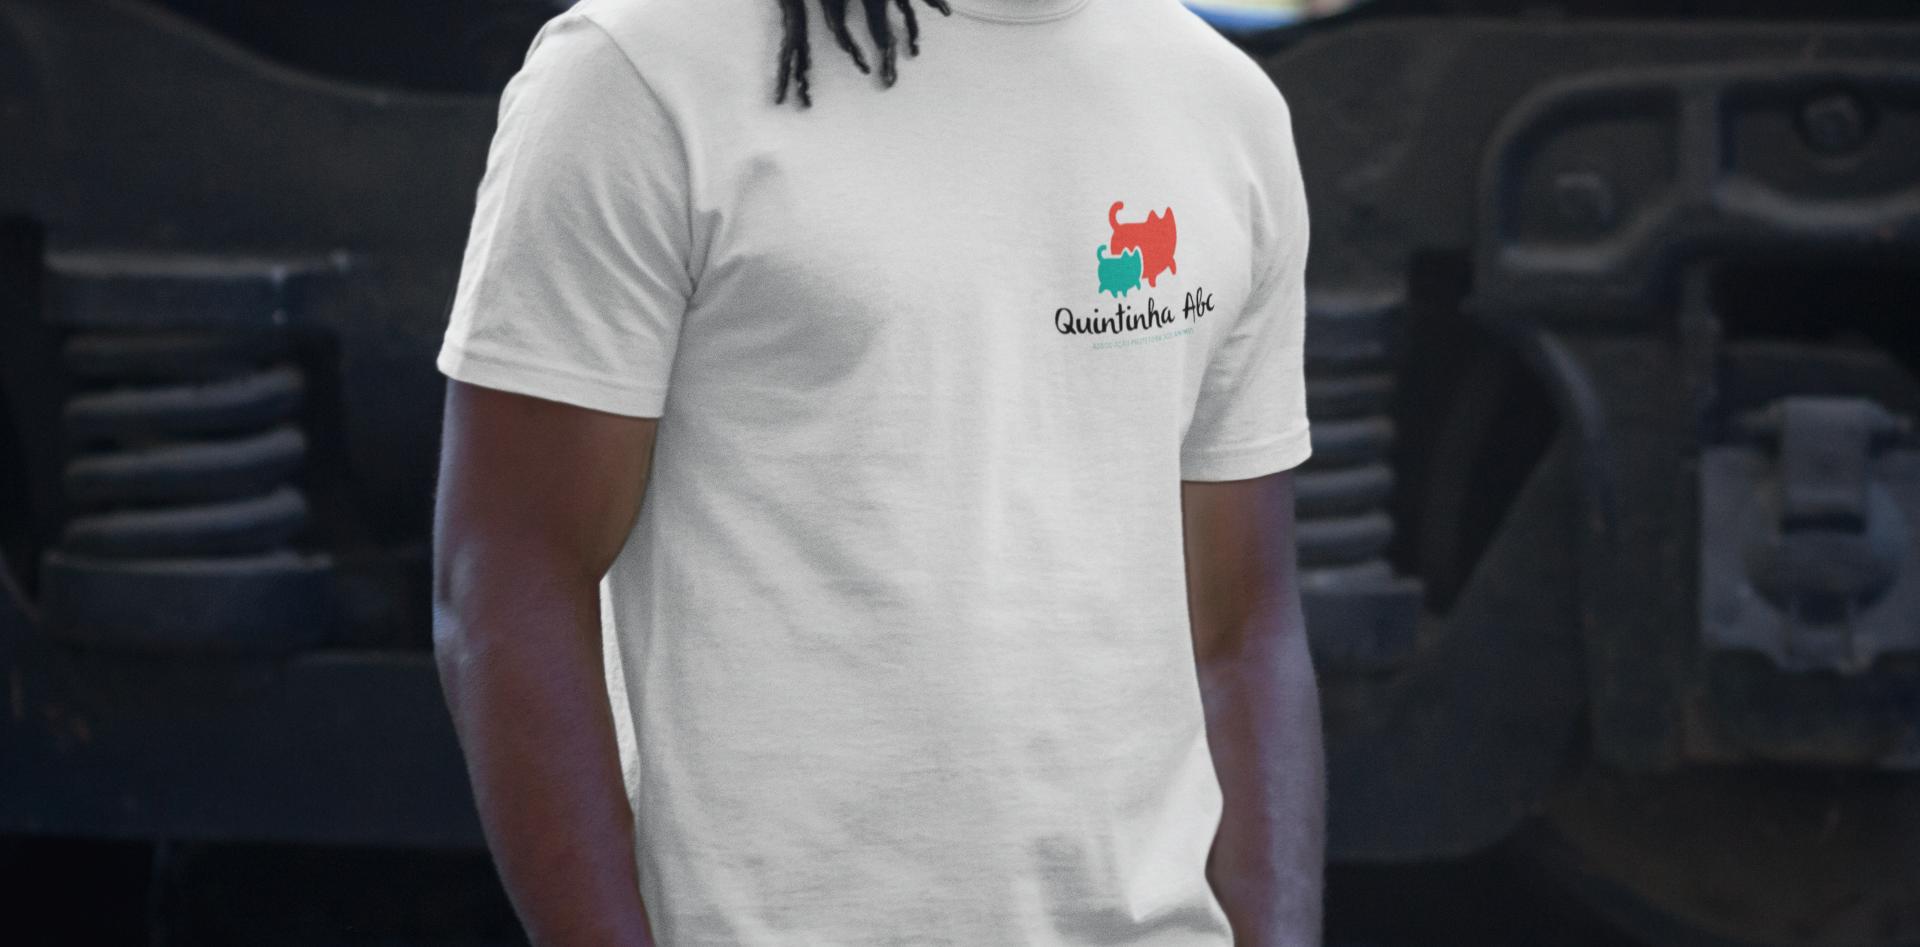 tshirt-mockup-of-a-man-with-dreadlocks-a